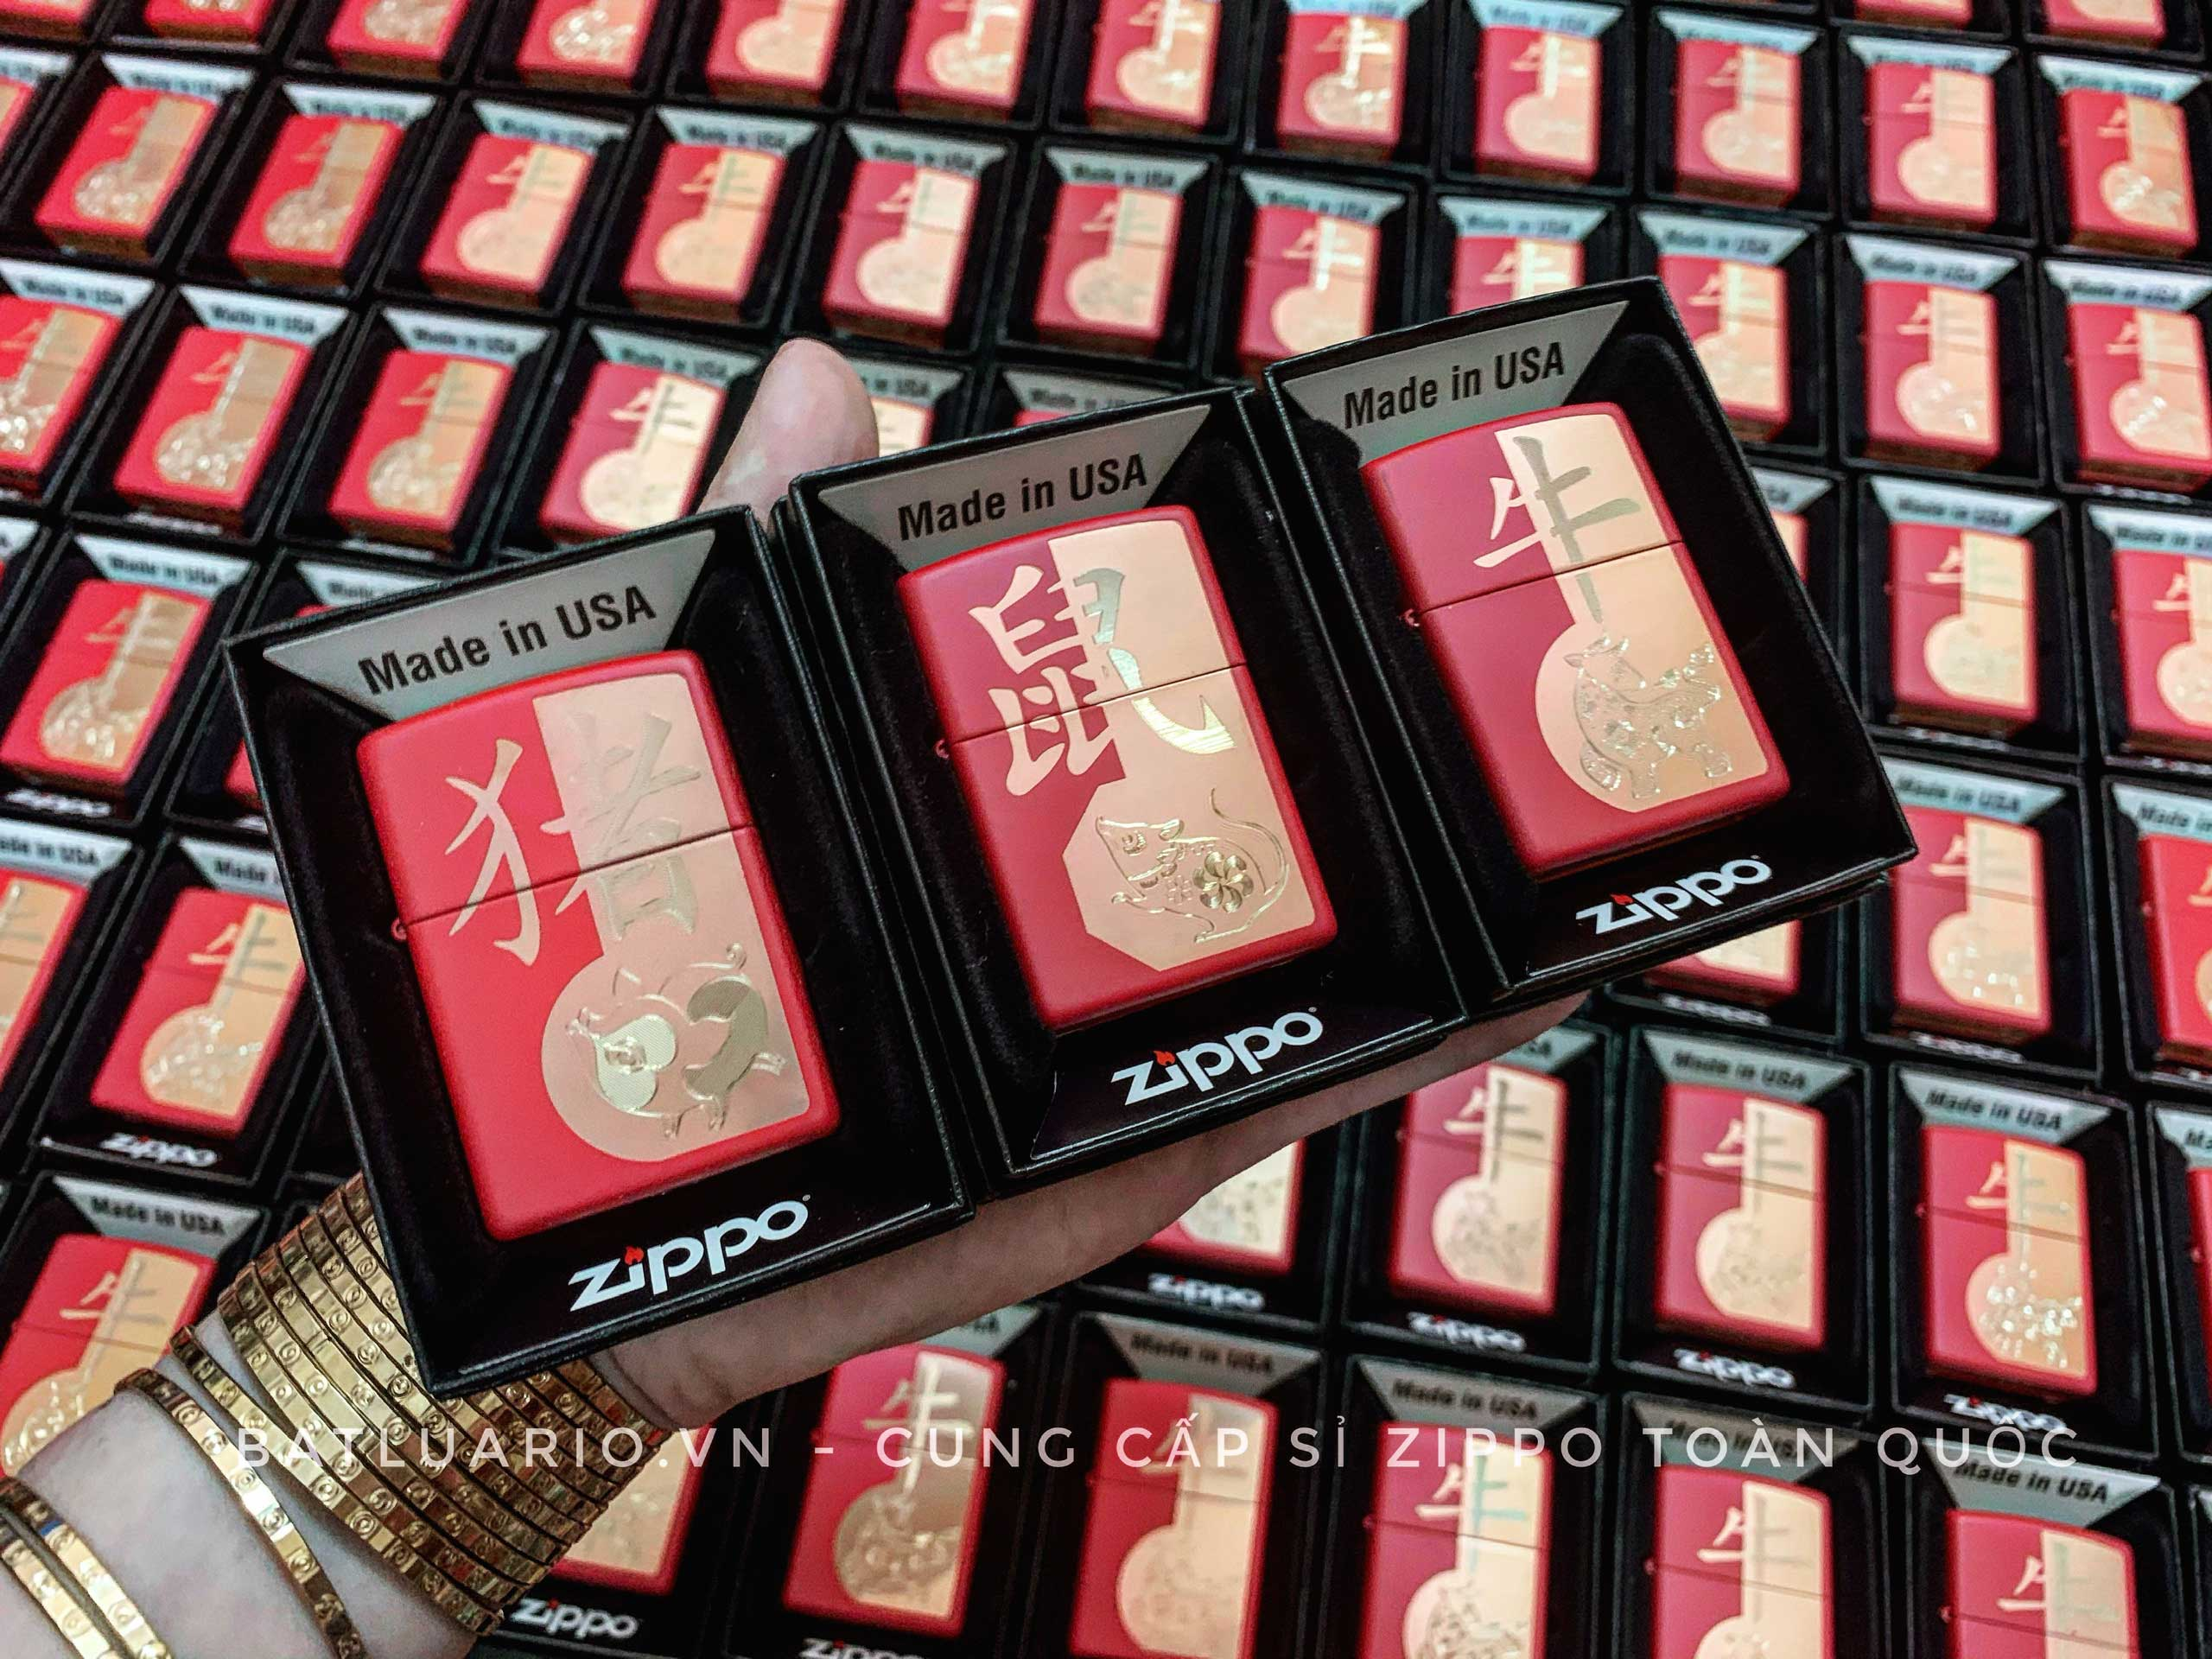 Zippo 49233 - Zippo Year of the Ox Red Matte 12